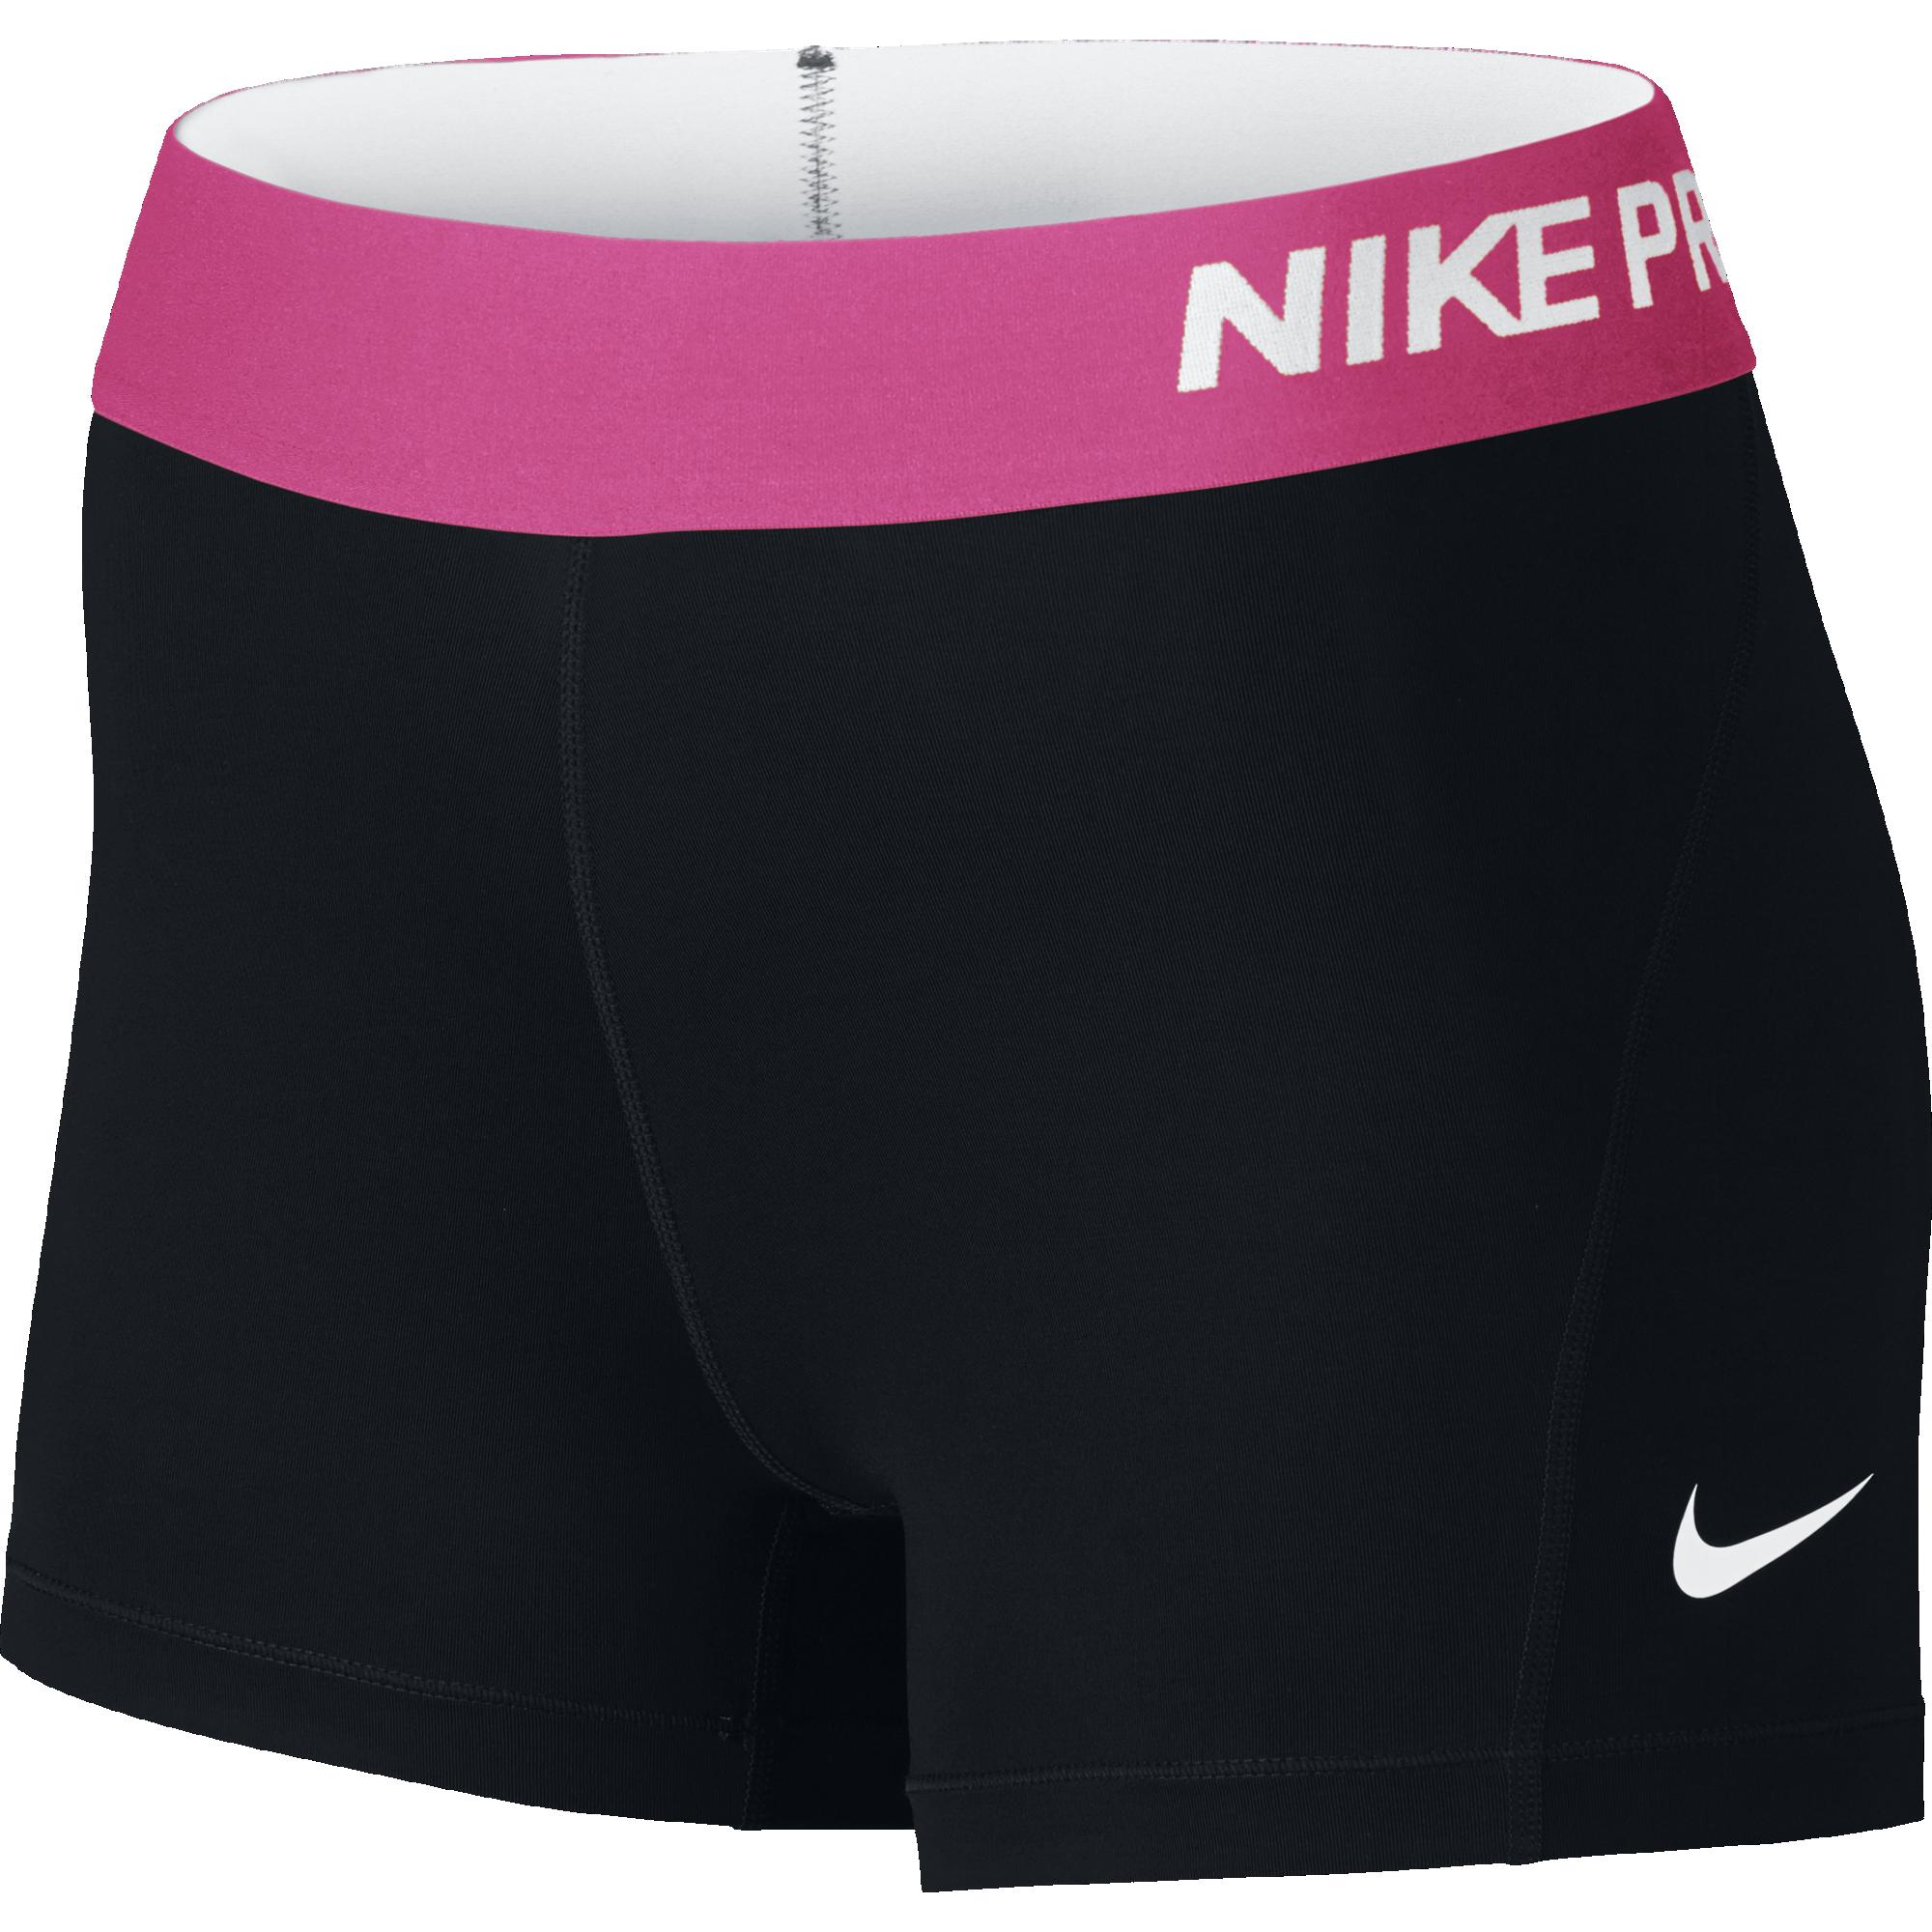 962a6ea2b0 Nike Women